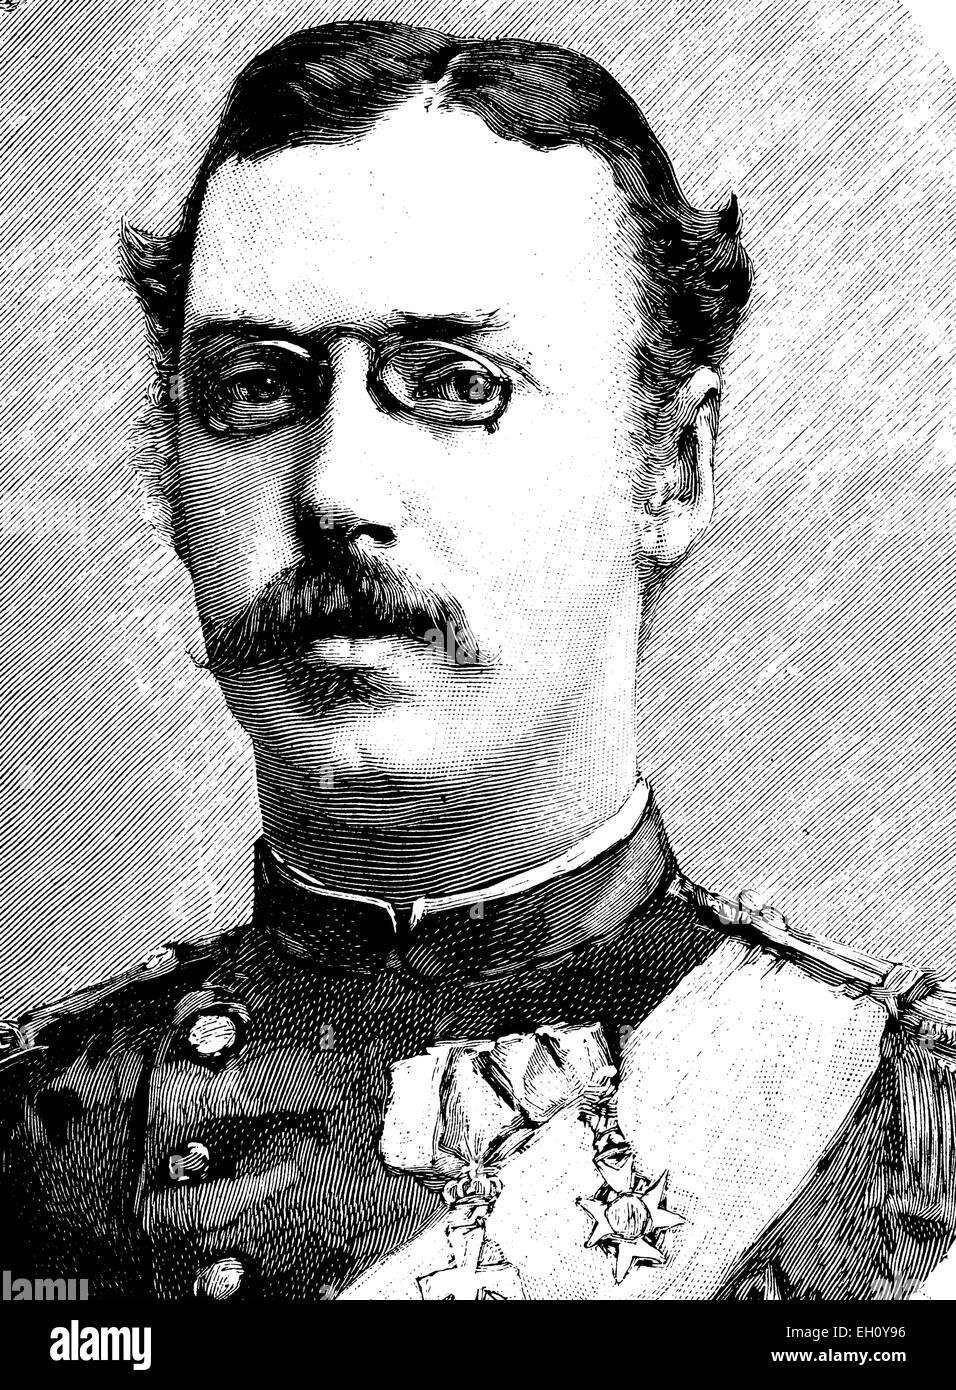 Prince Waldemar of Denmark (1858-1939), historical illustration, circa 1886 - Stock Image